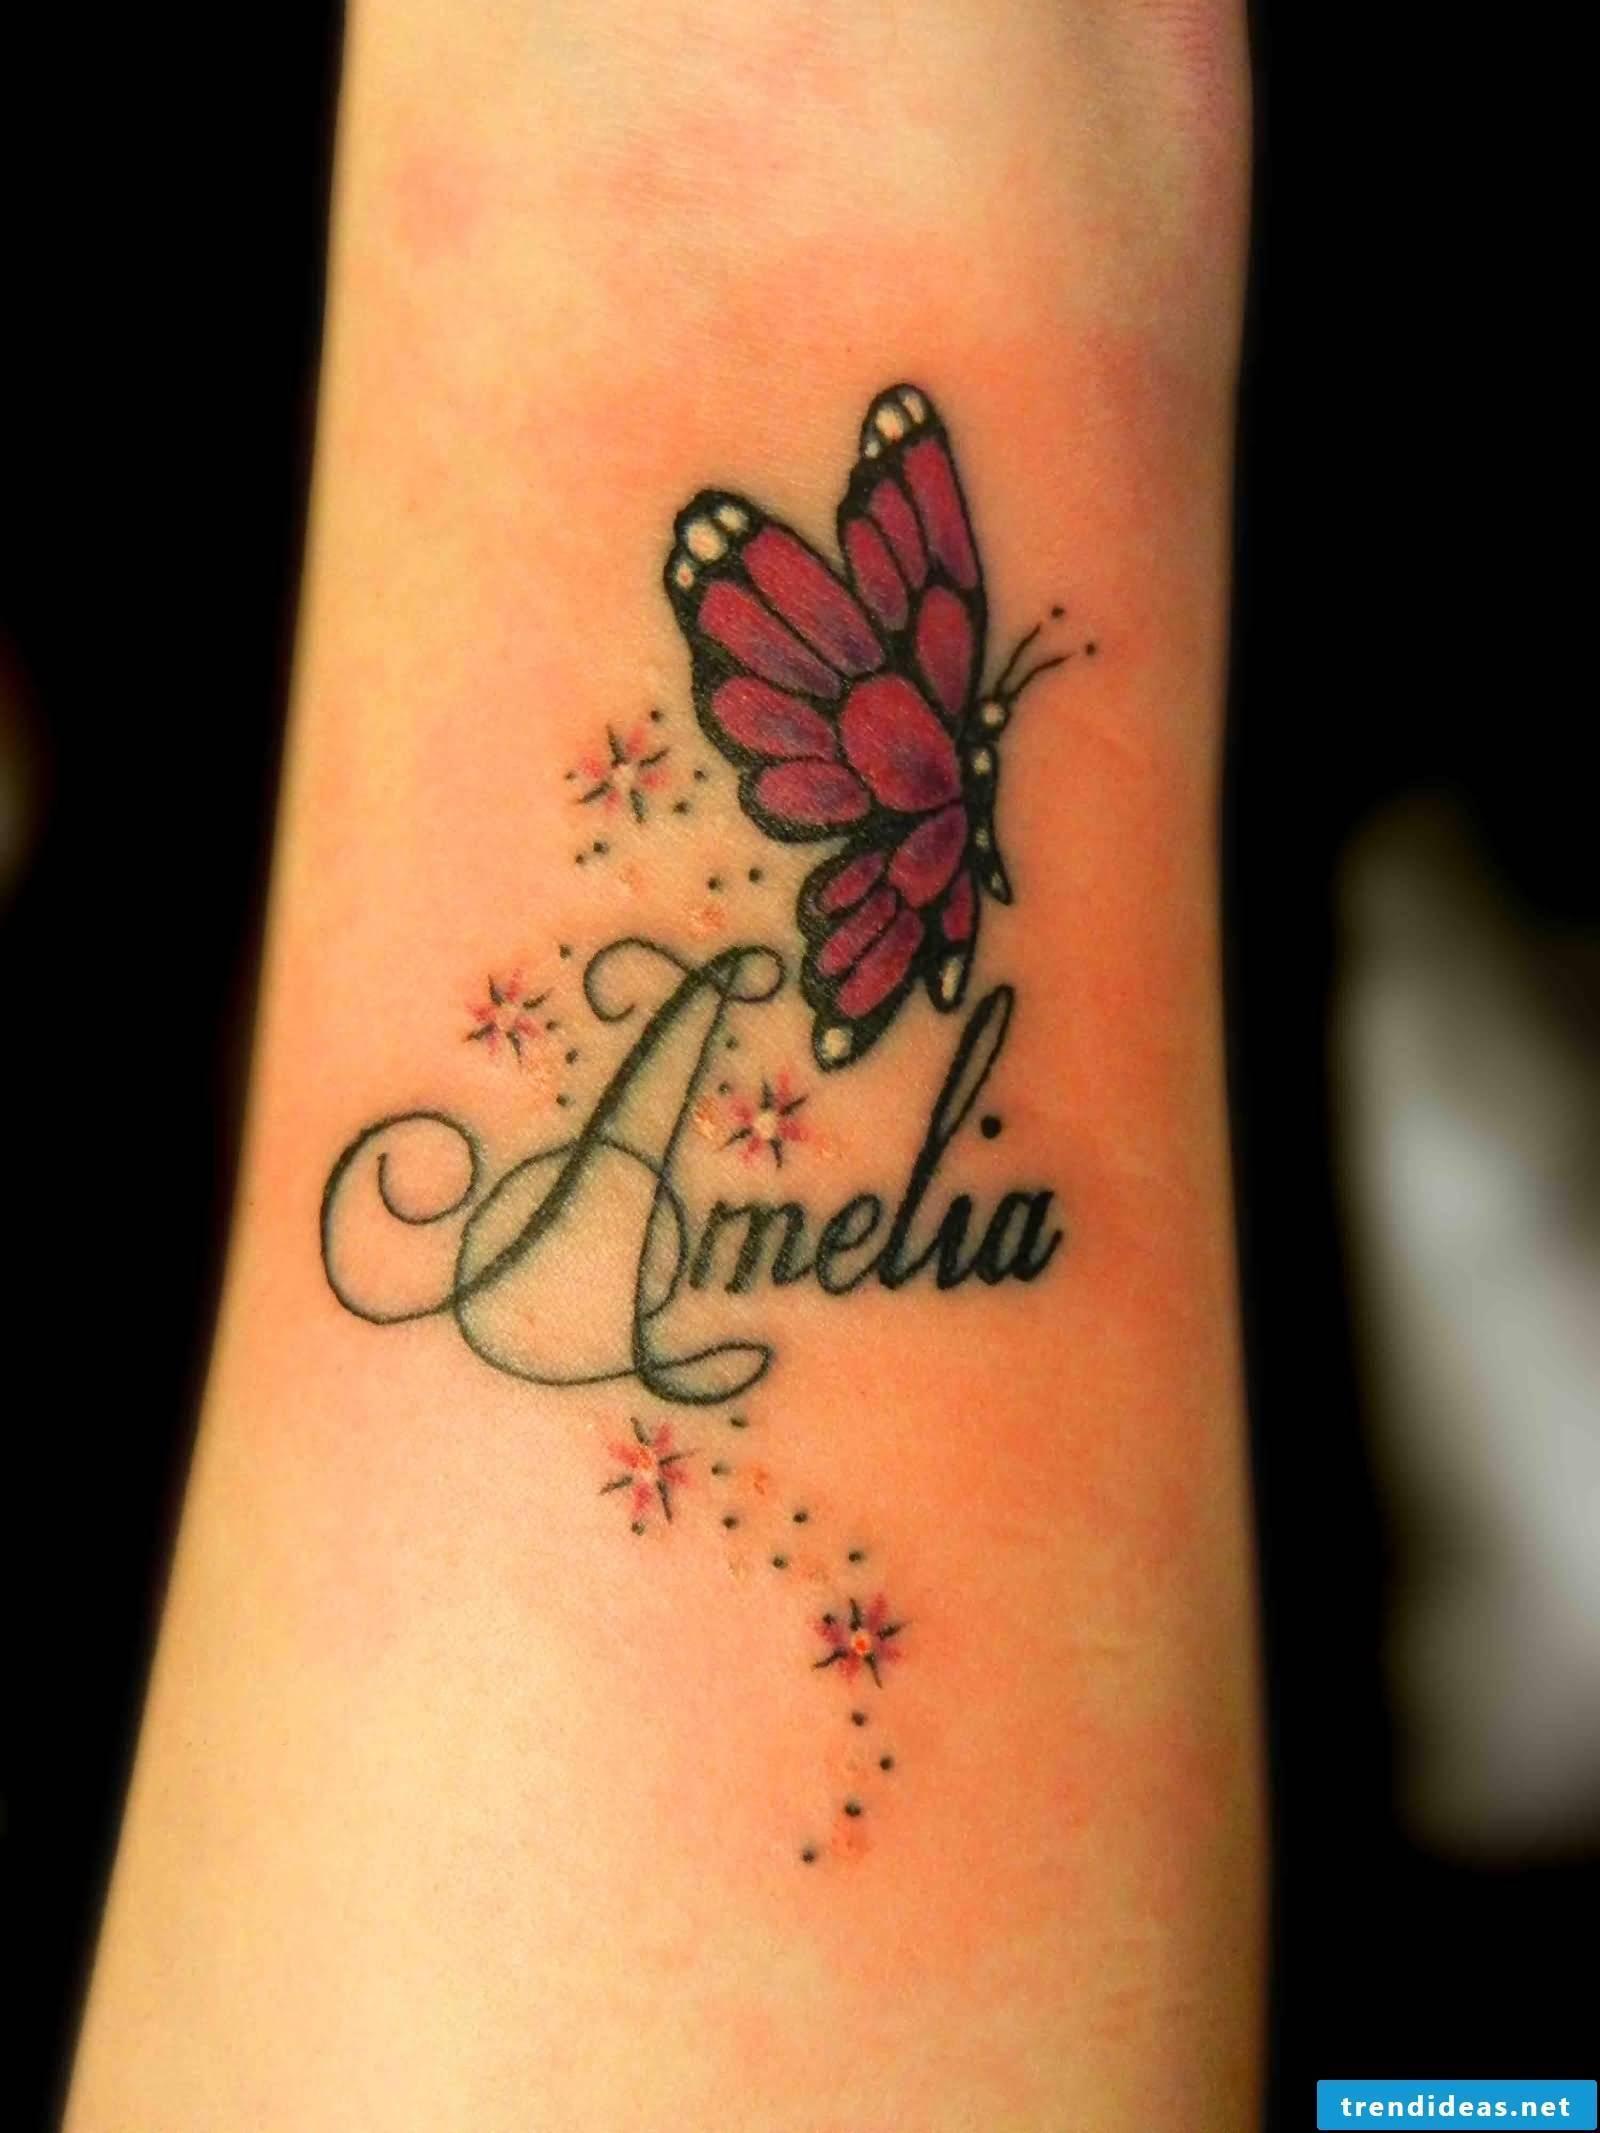 Amelia to love